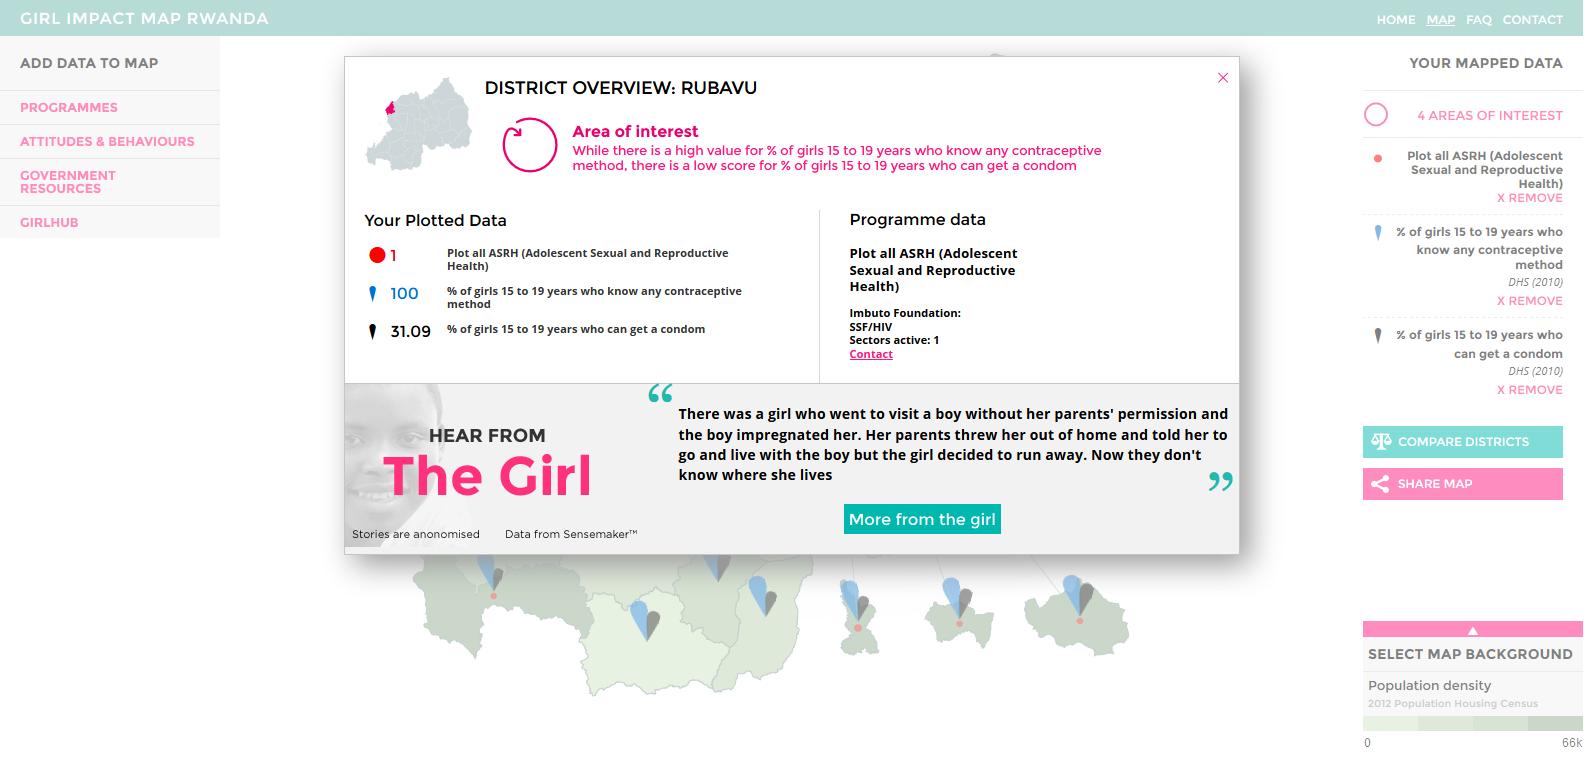 Girl Impact Map - District Detail